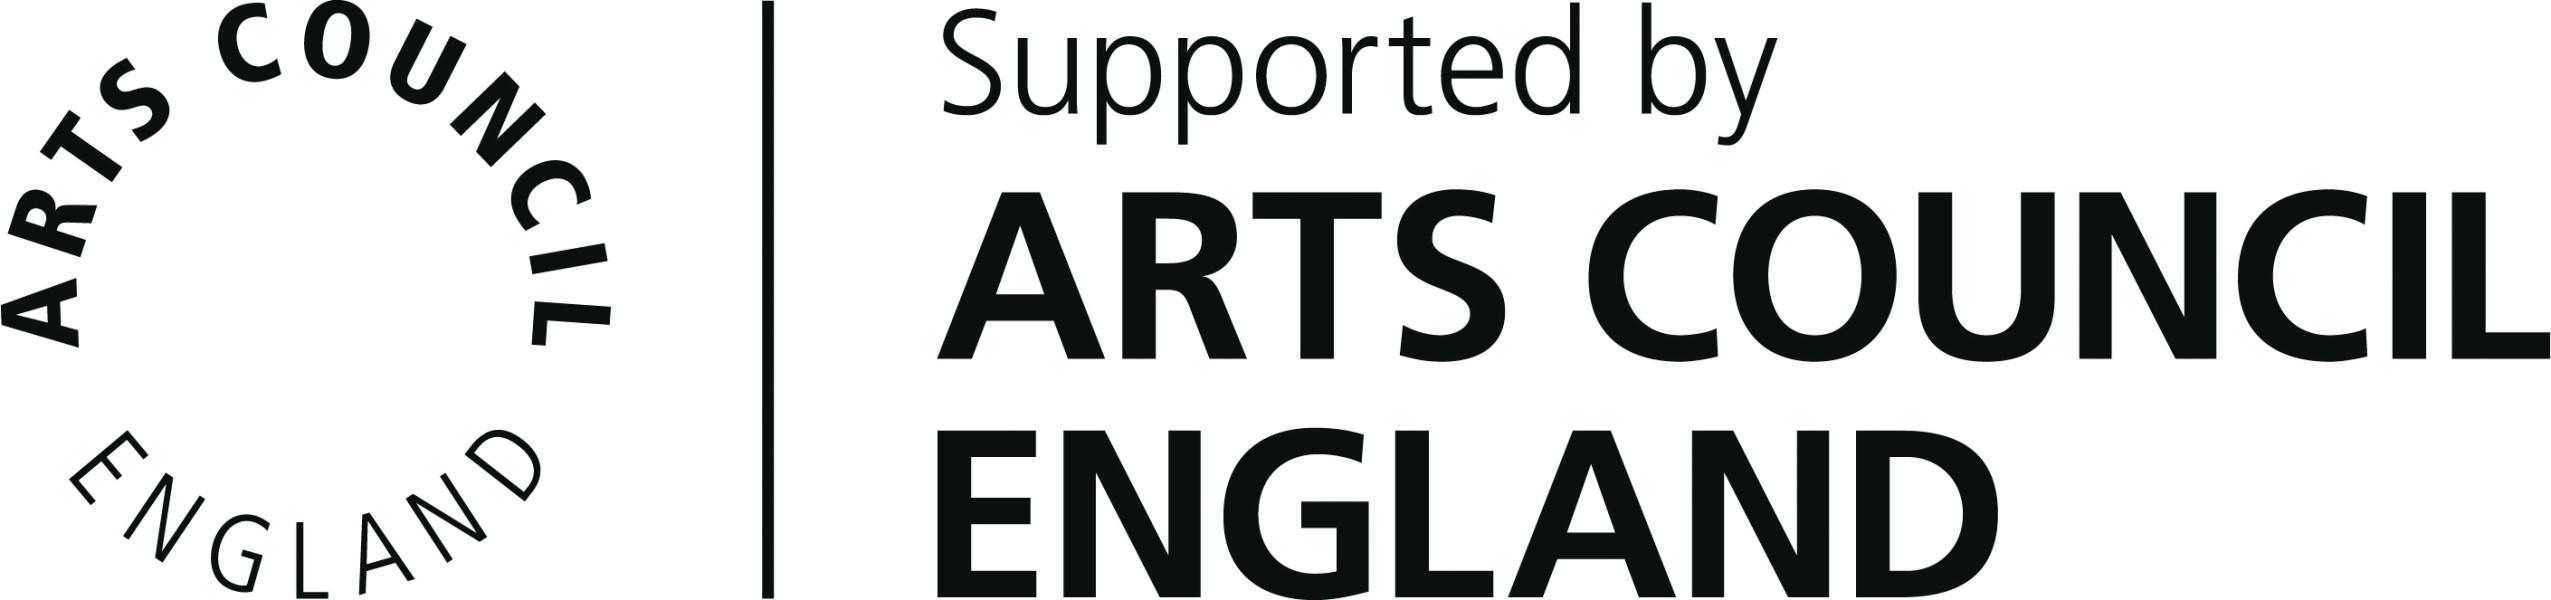 Image of Arts Council England logo